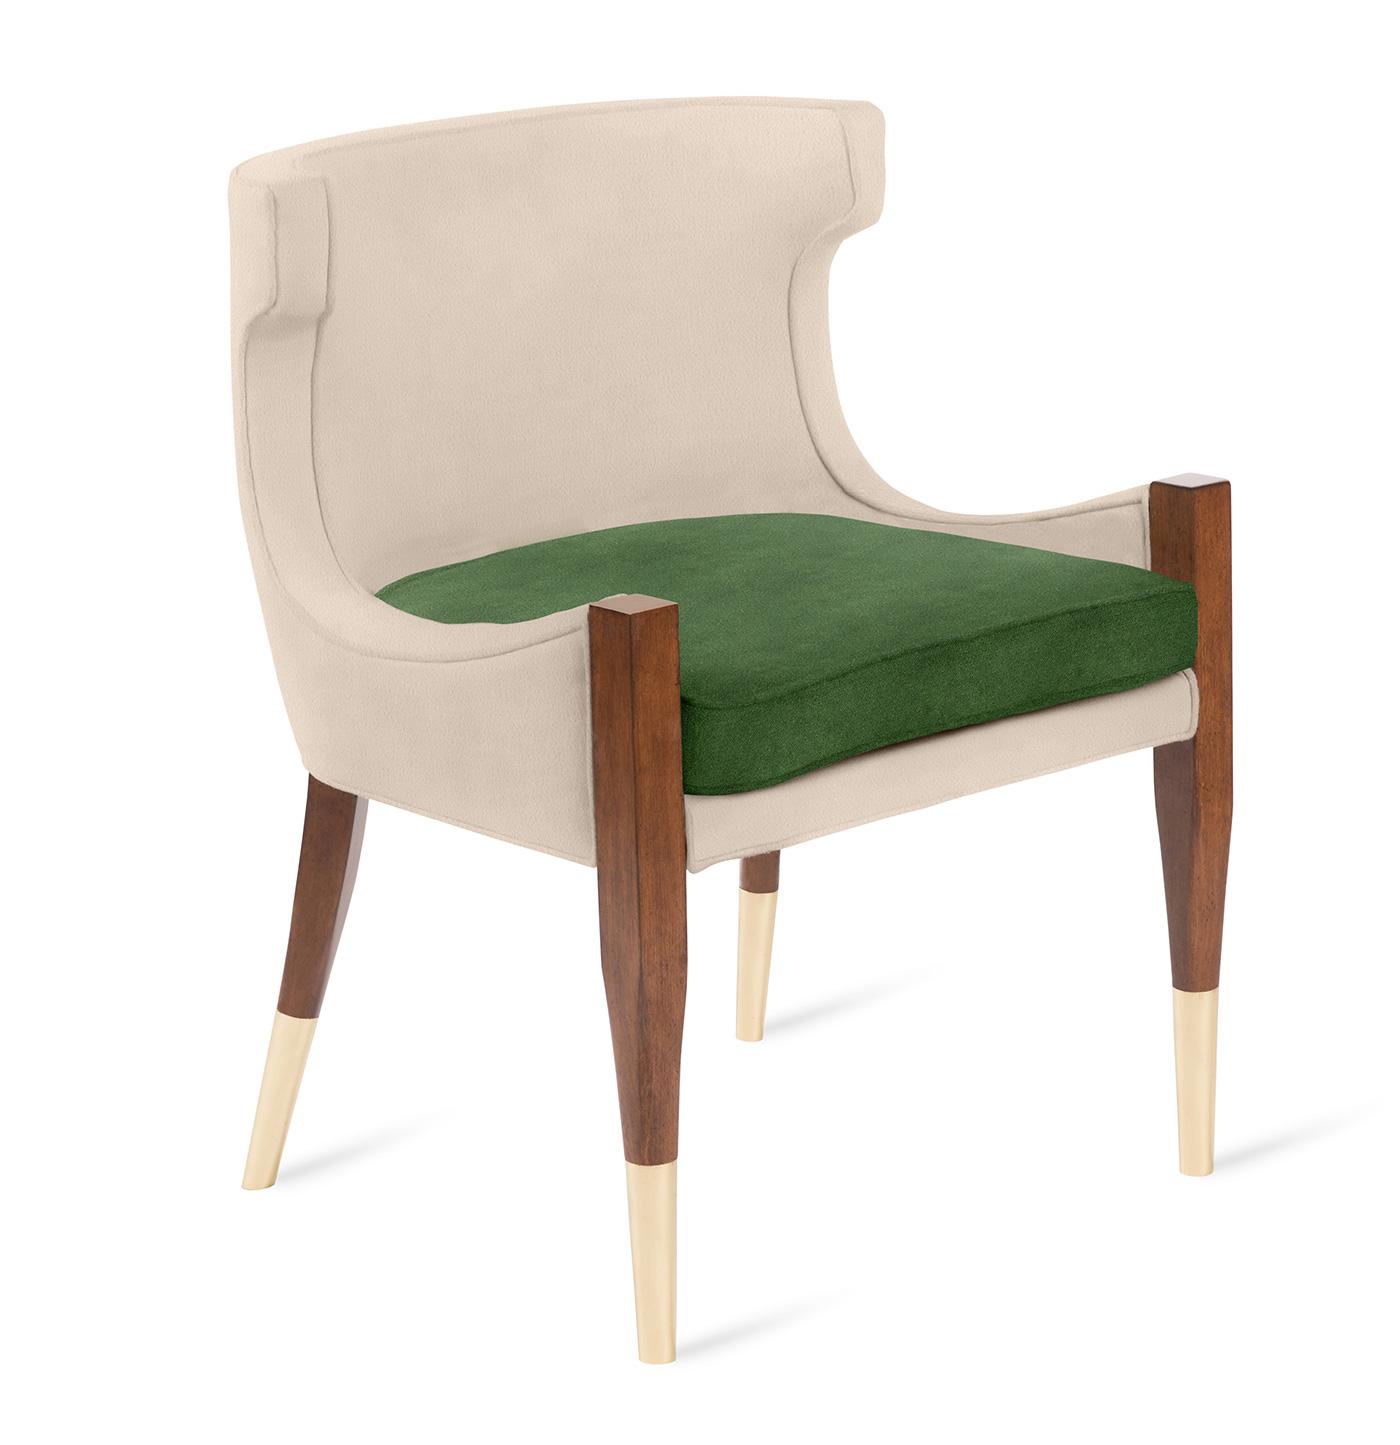 High-end armchair by Boston interior designer